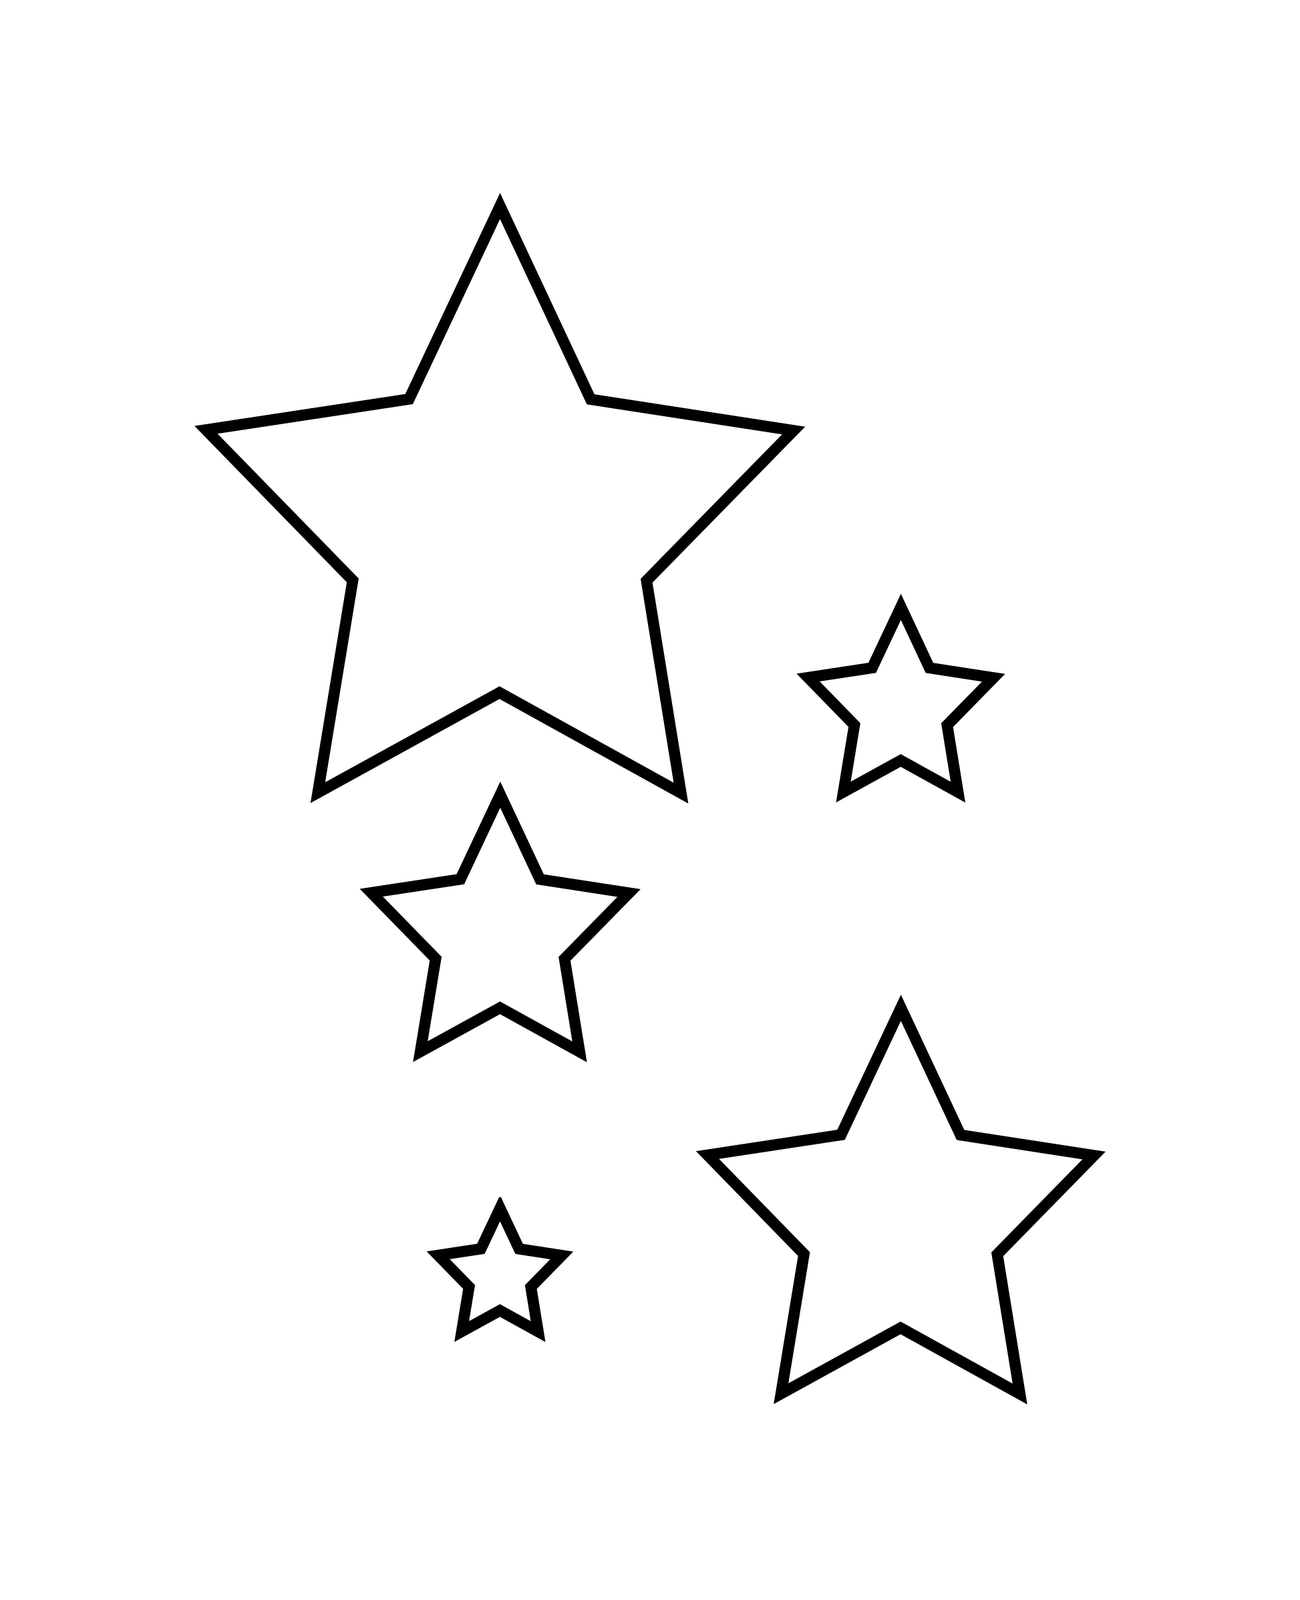 Large Star Template Printable